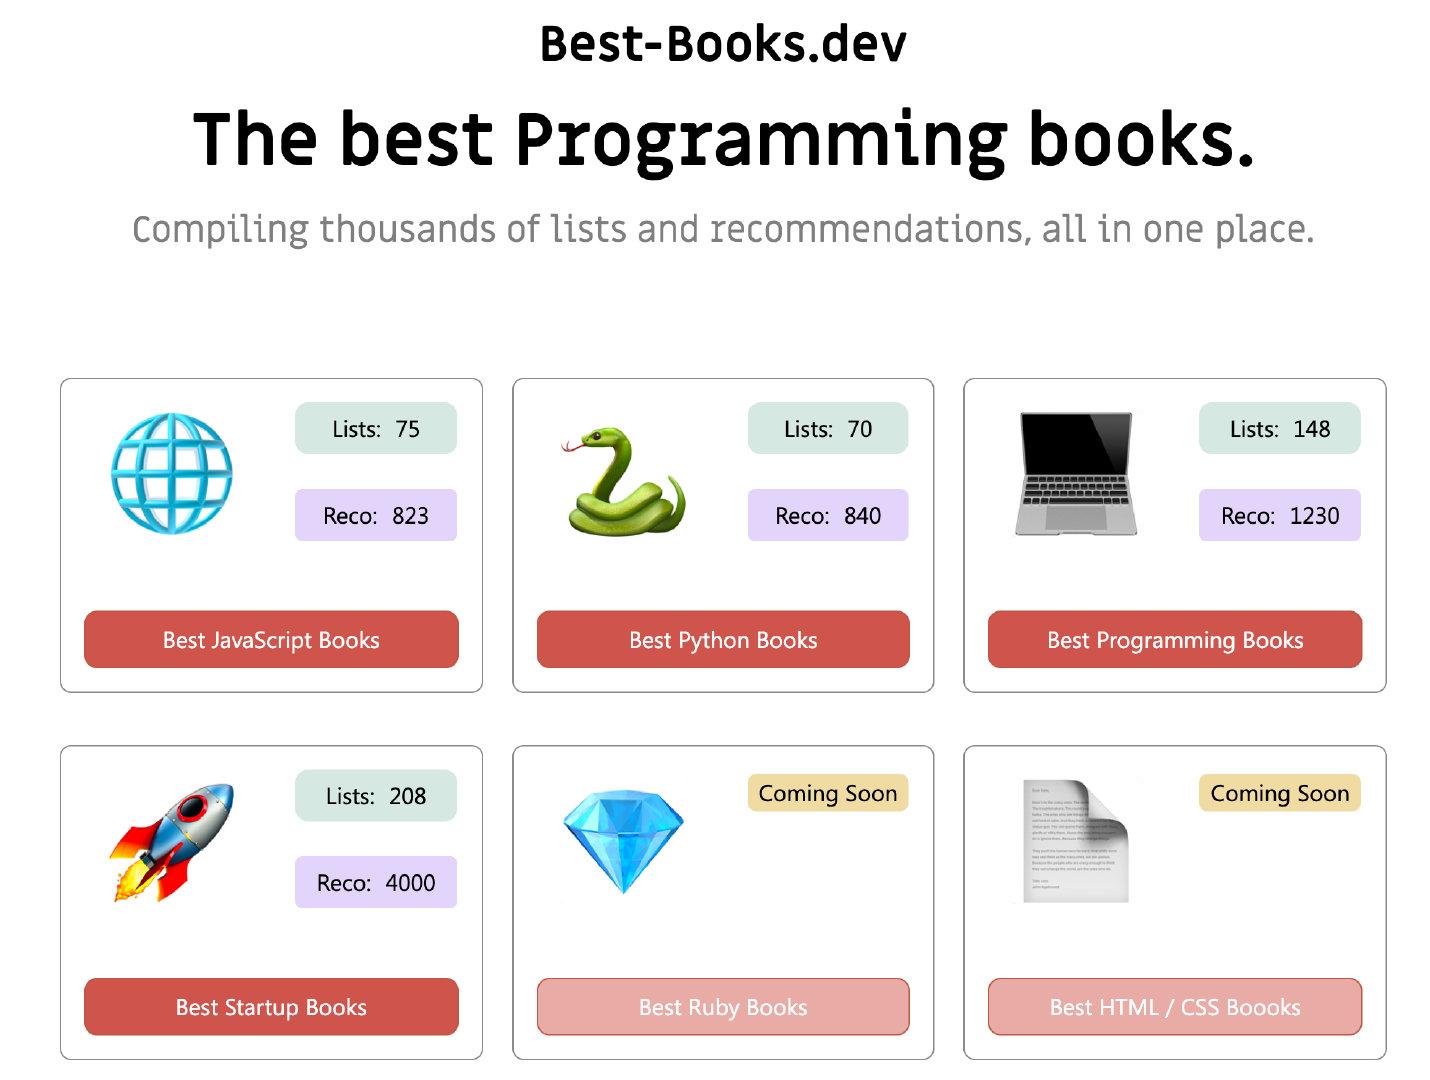 ◎ Best-Books.dev